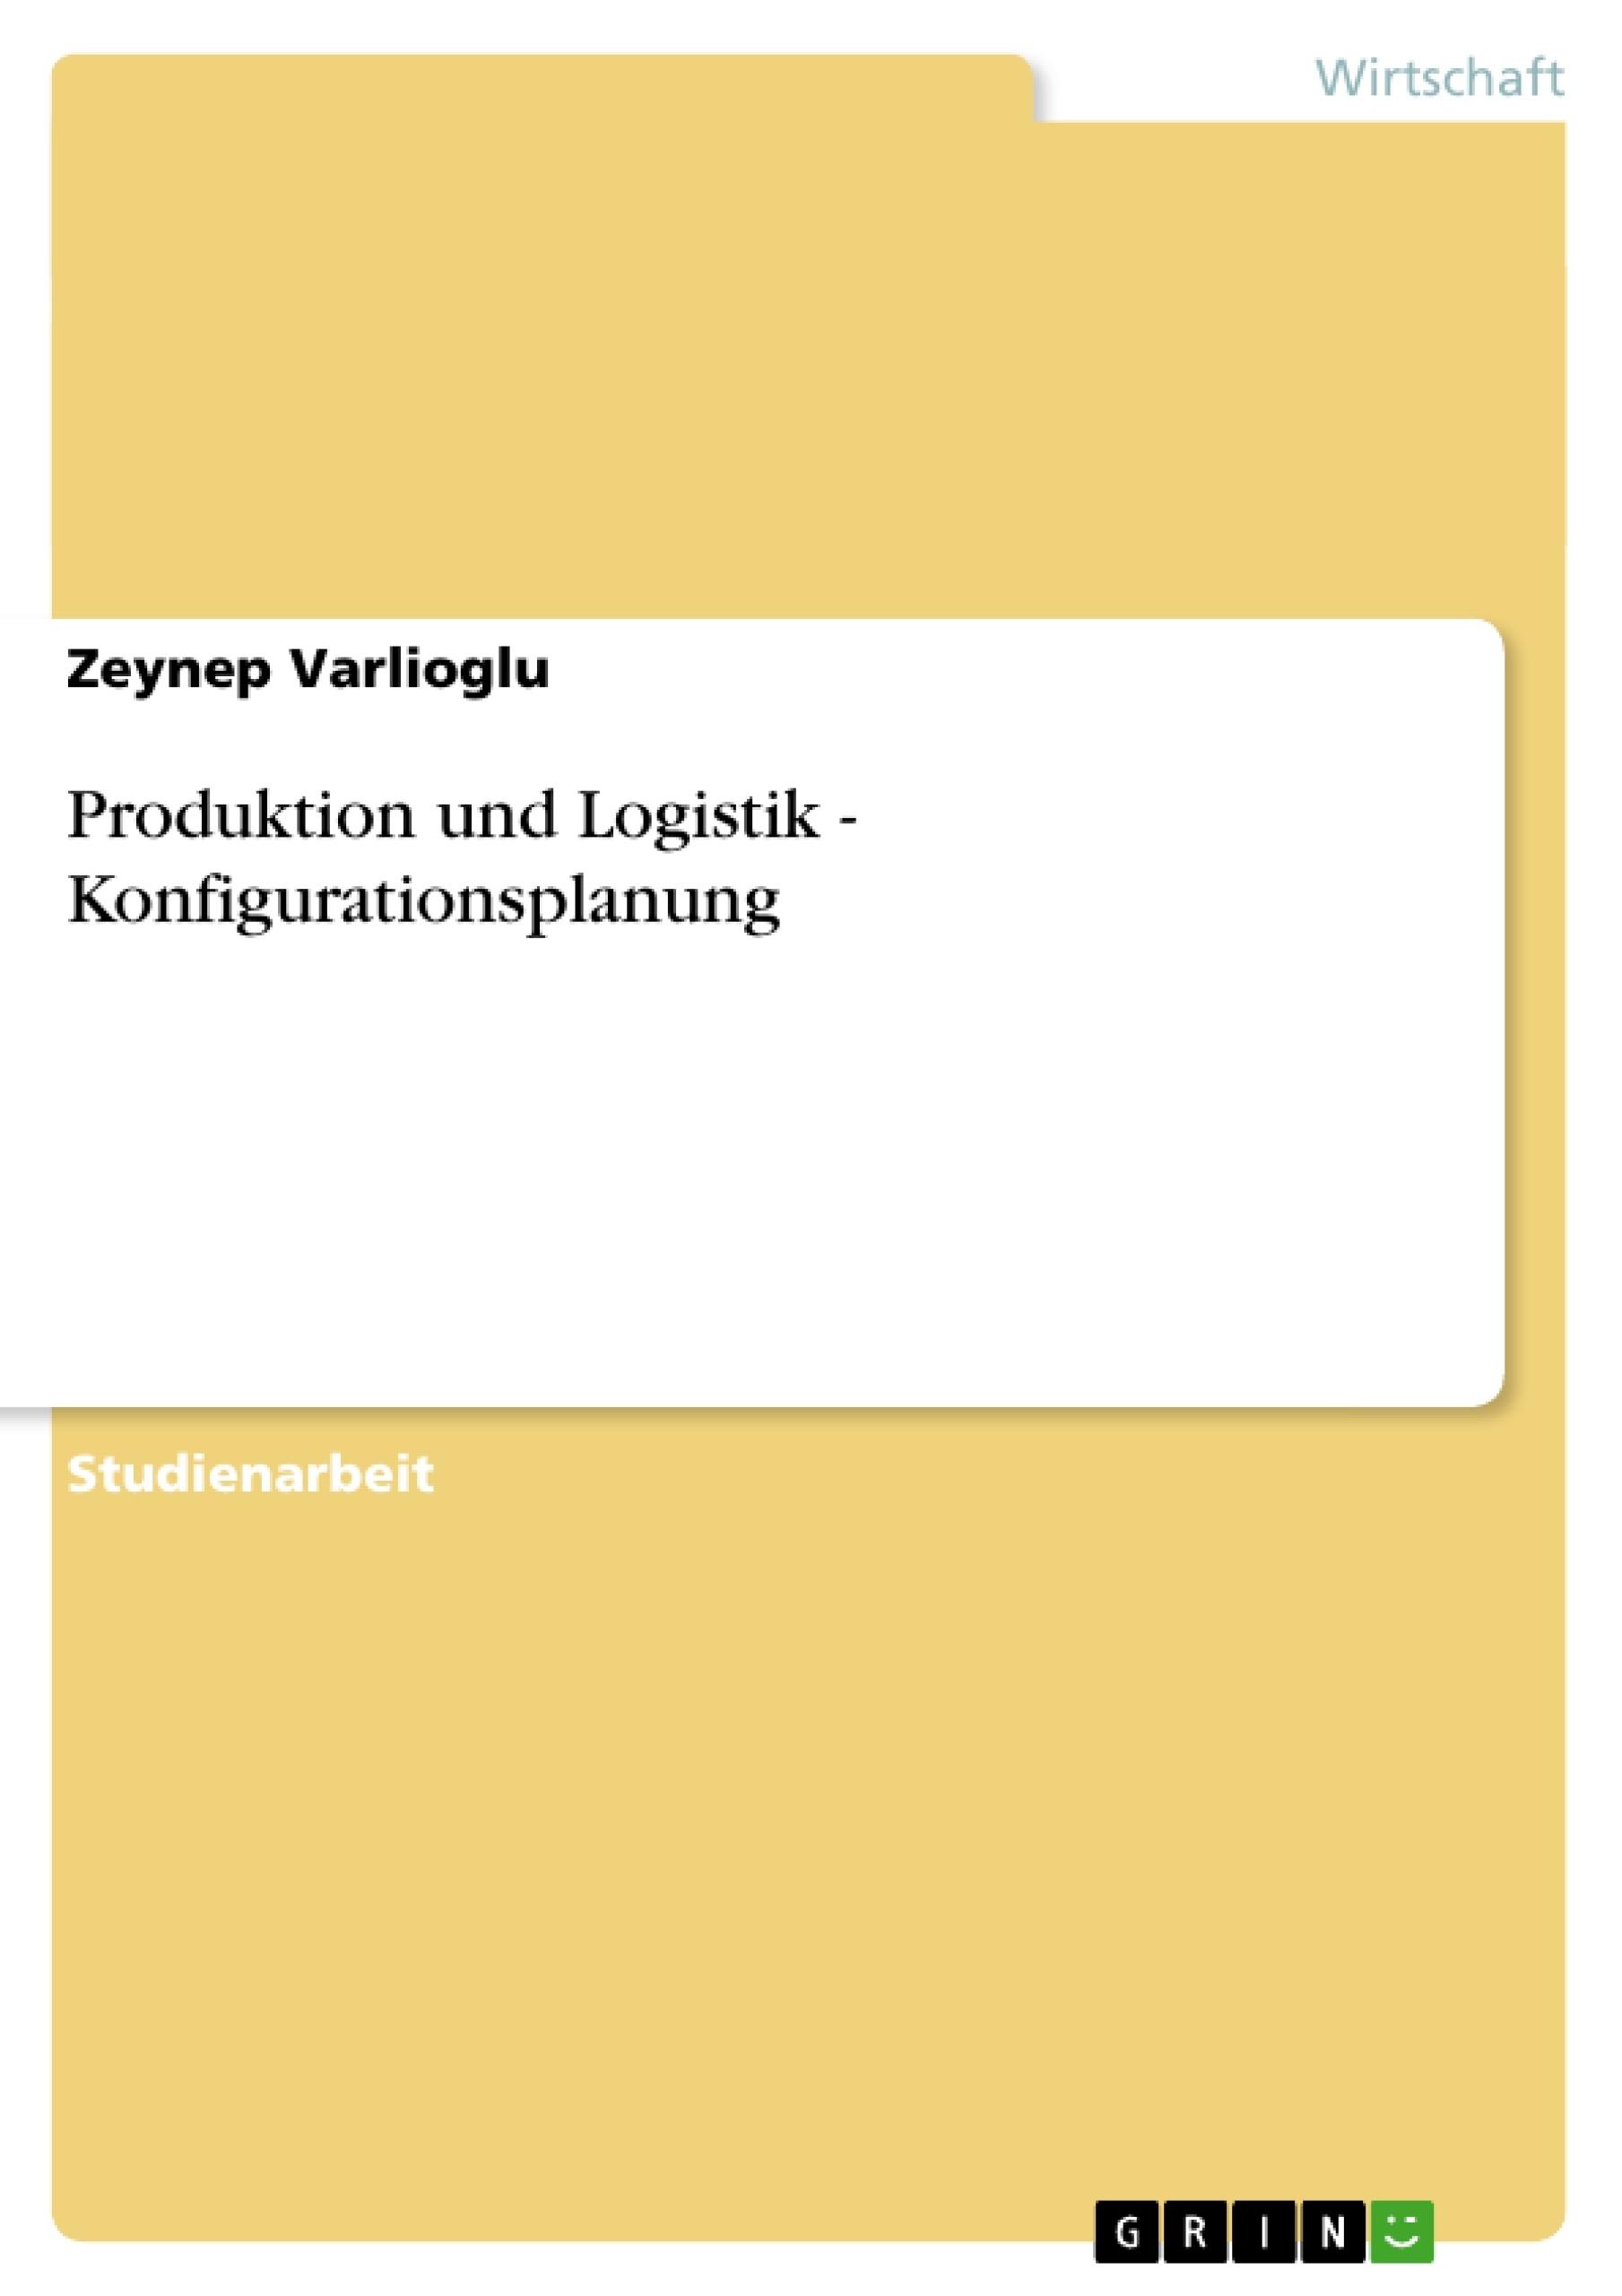 Titel: Produktion und Logistik - Konfigurationsplanung